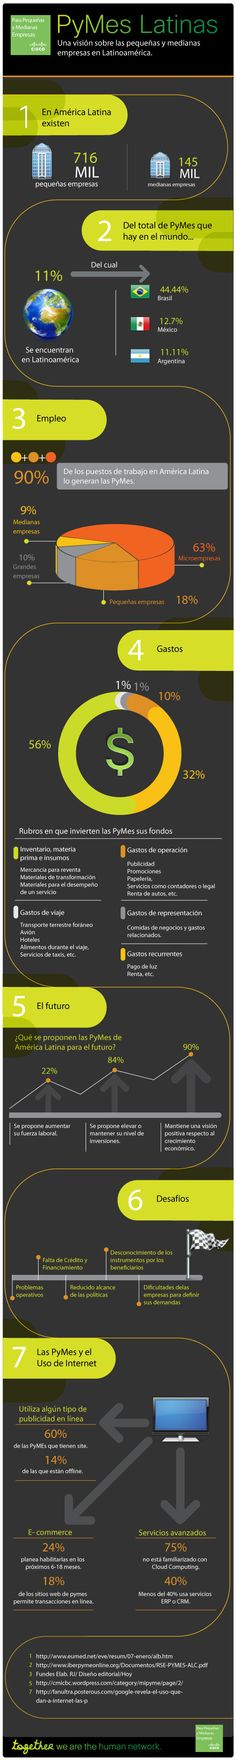 Las pymes en Latinoamérica #infografia